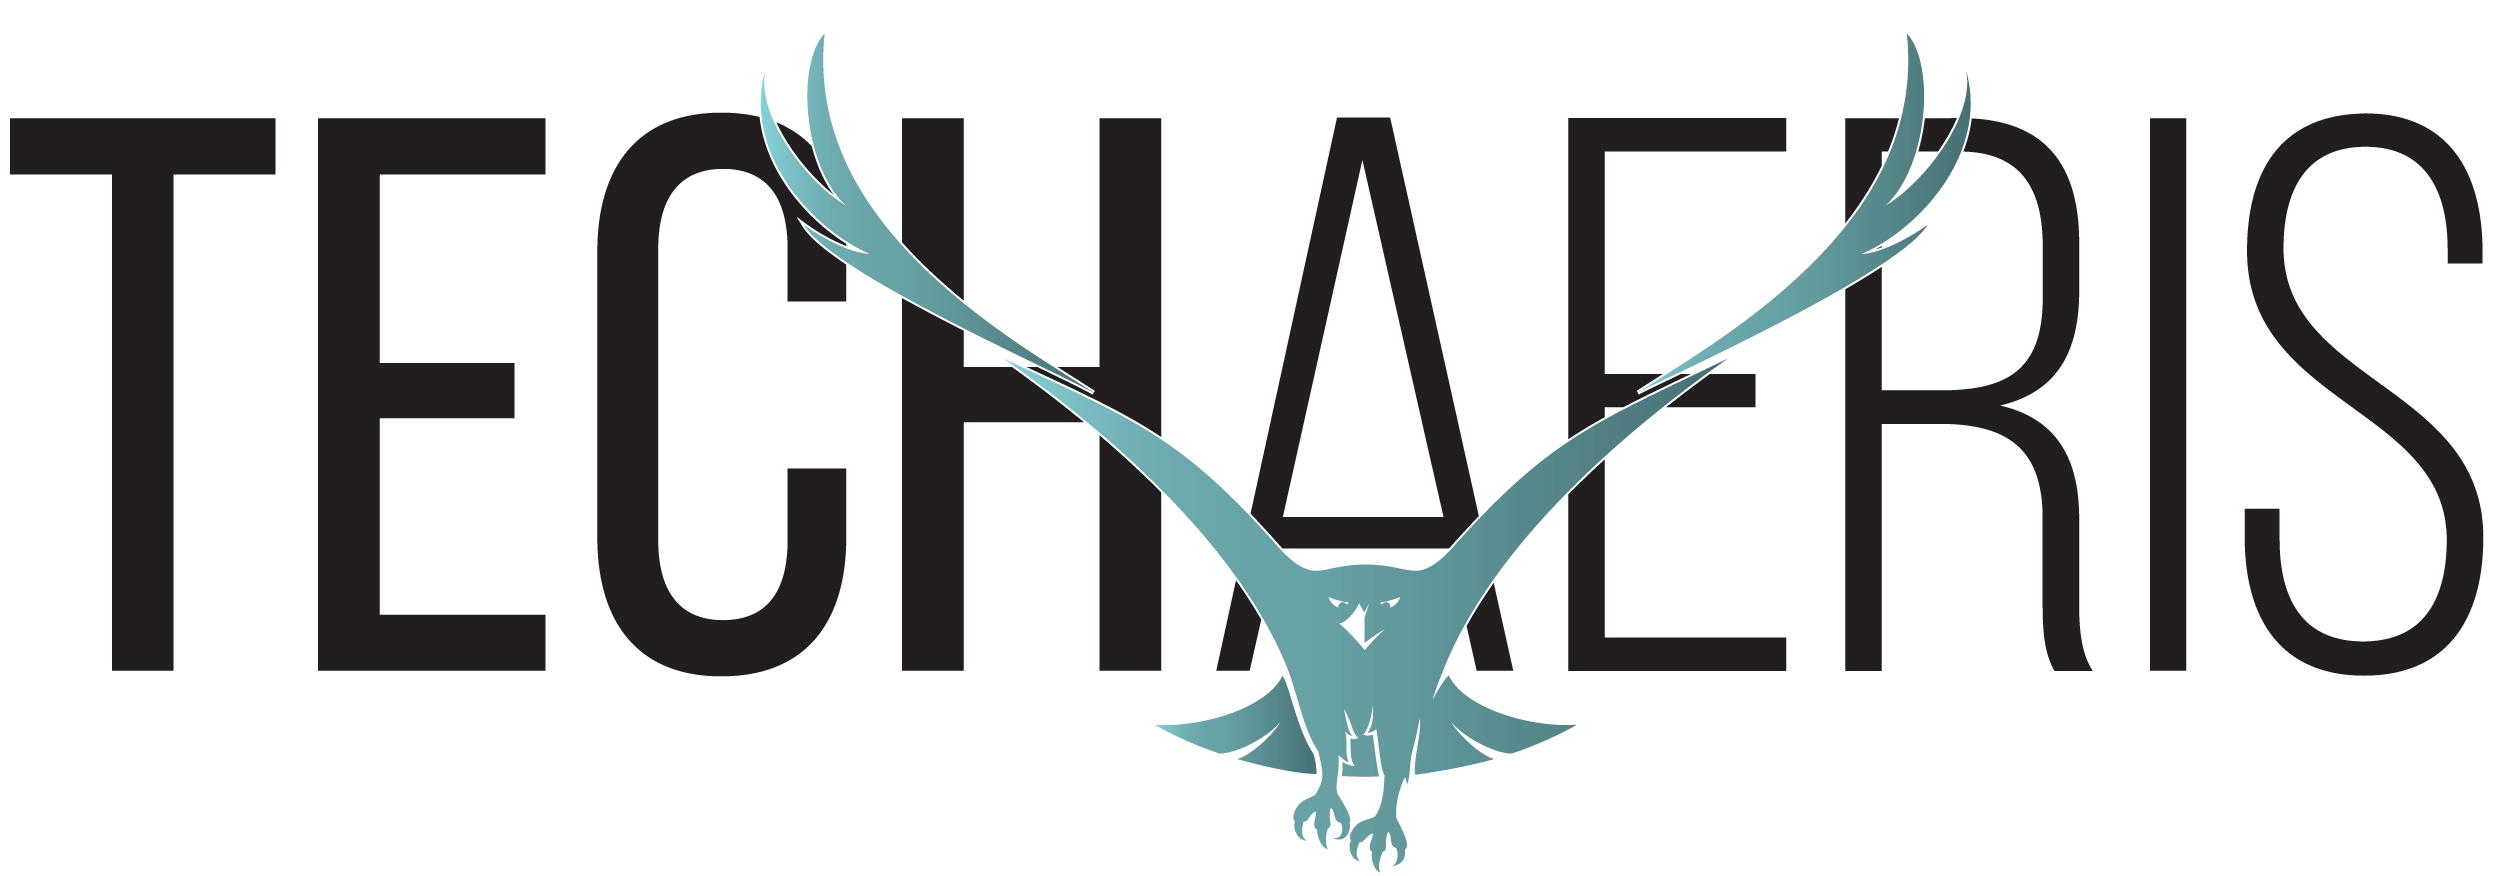 Techaeris Logo 2.0 Black Text